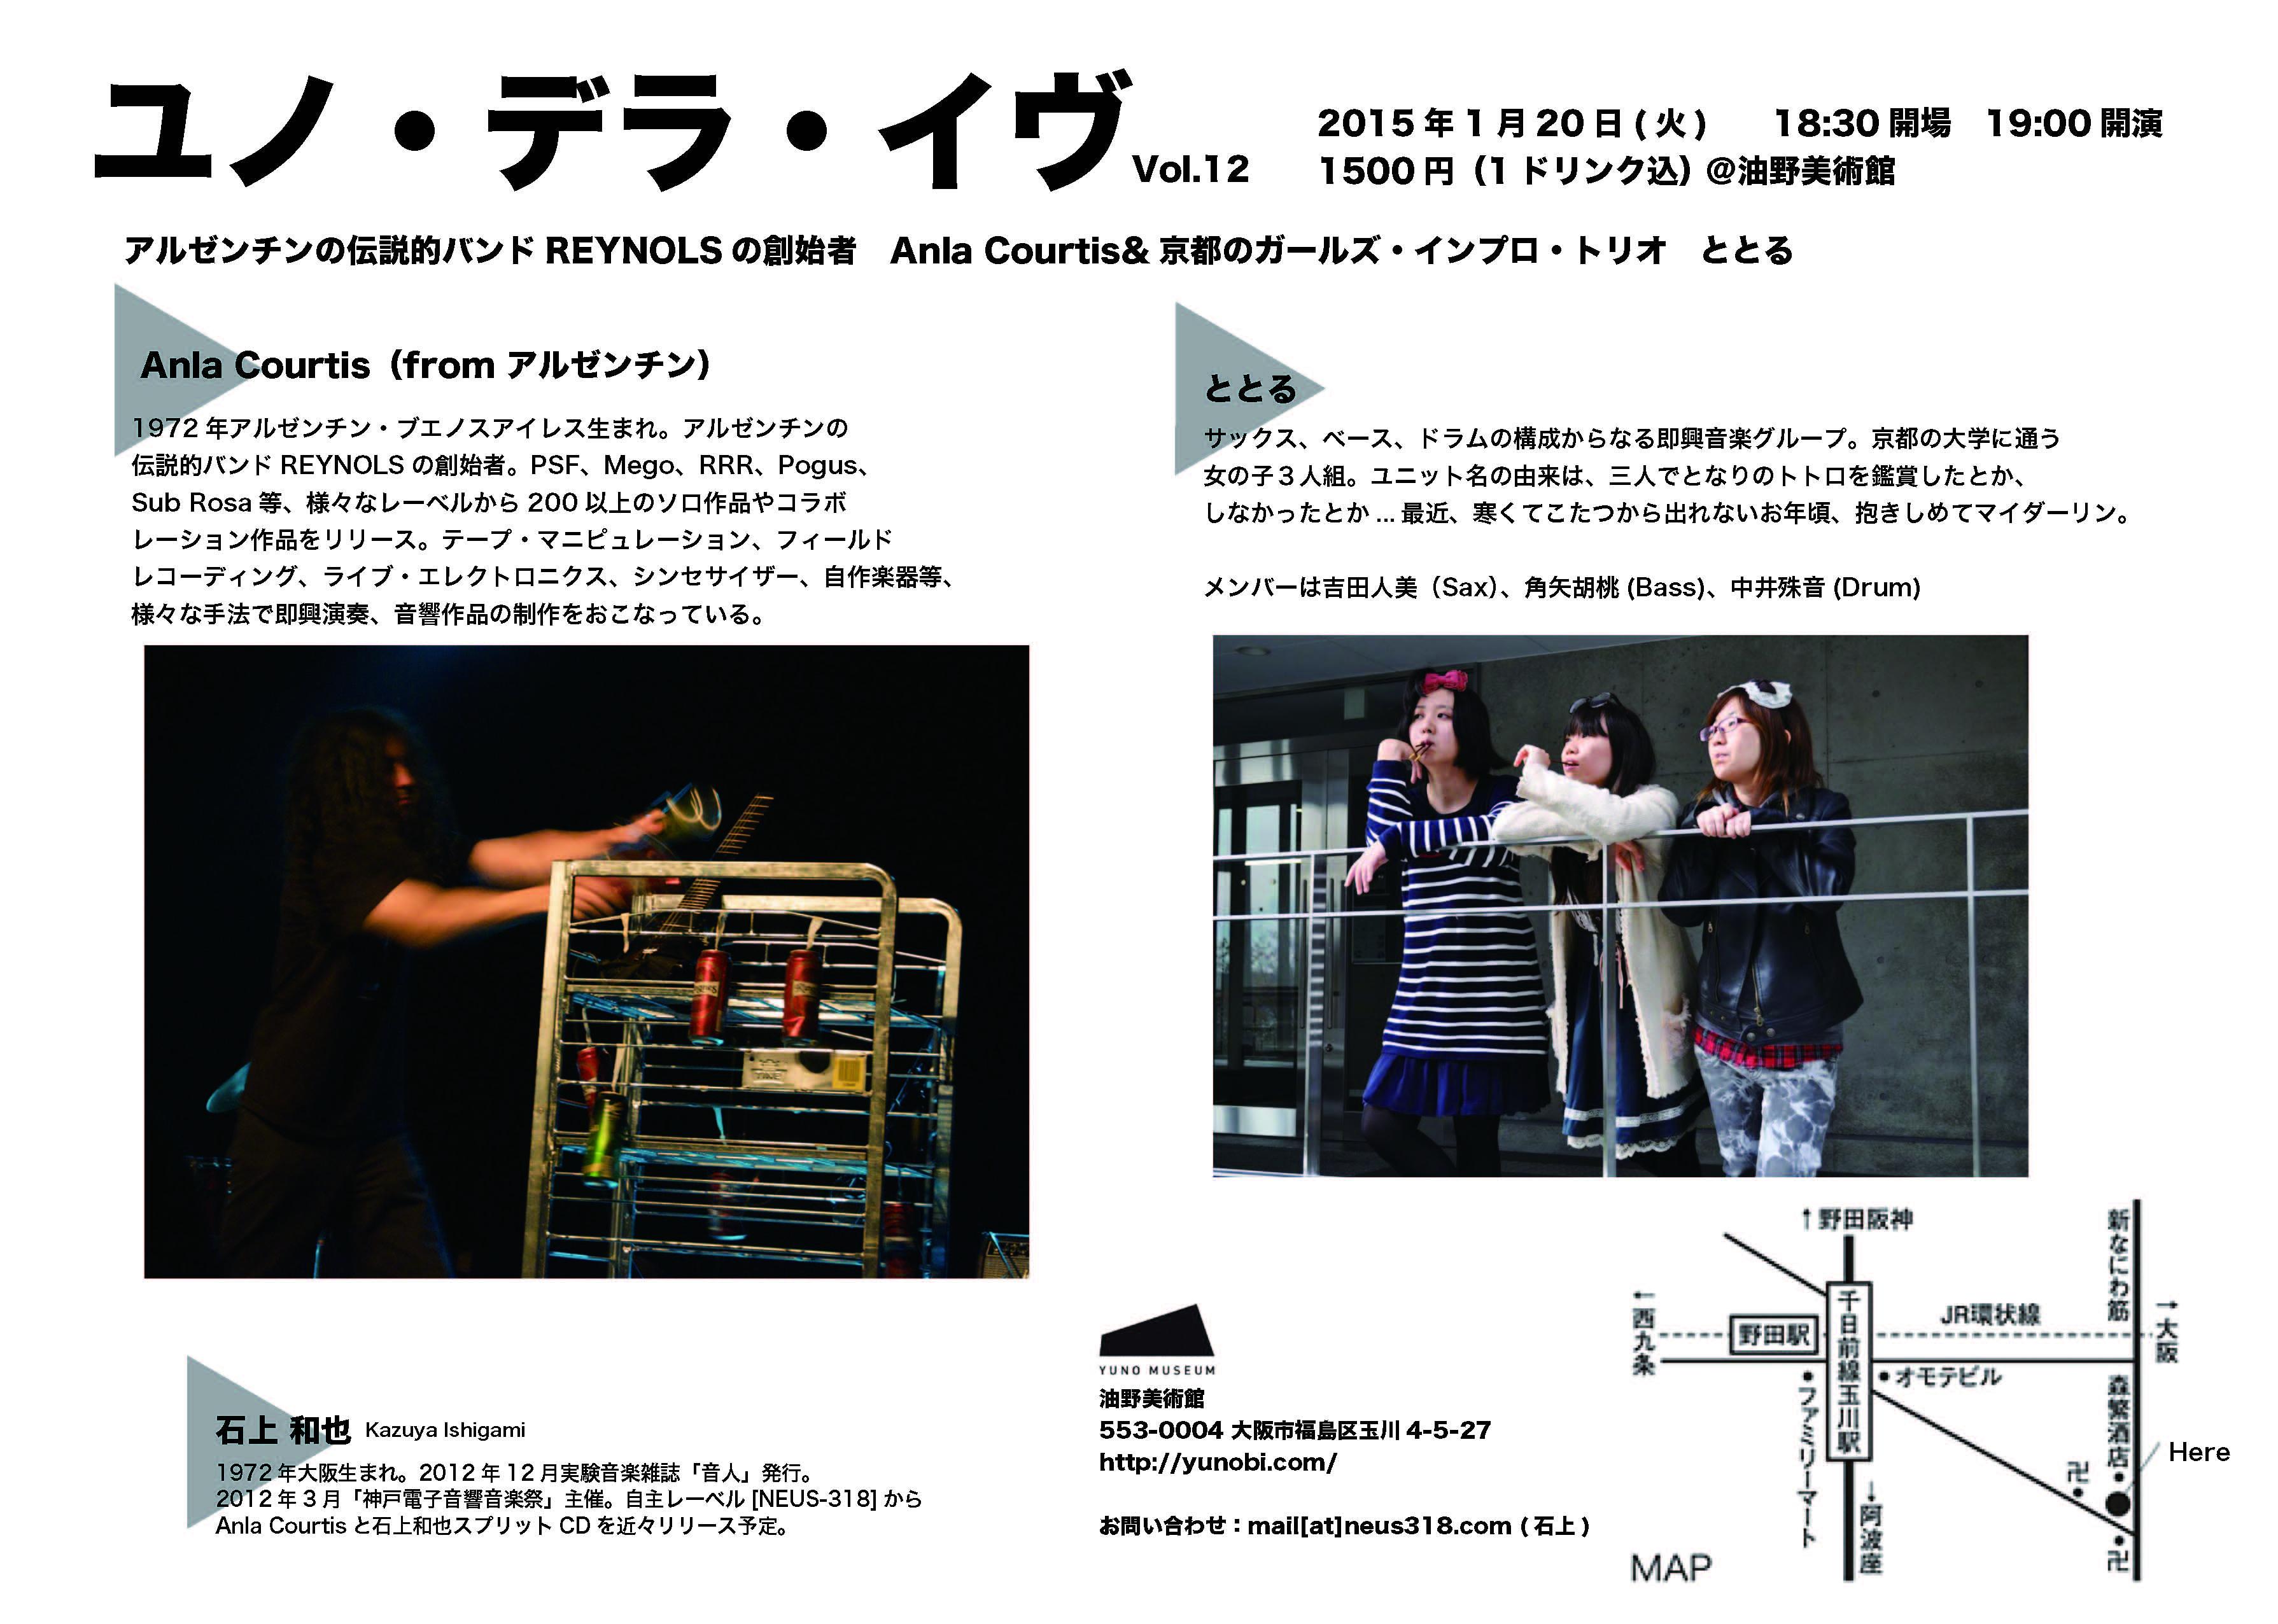 20150120yuno.jpg